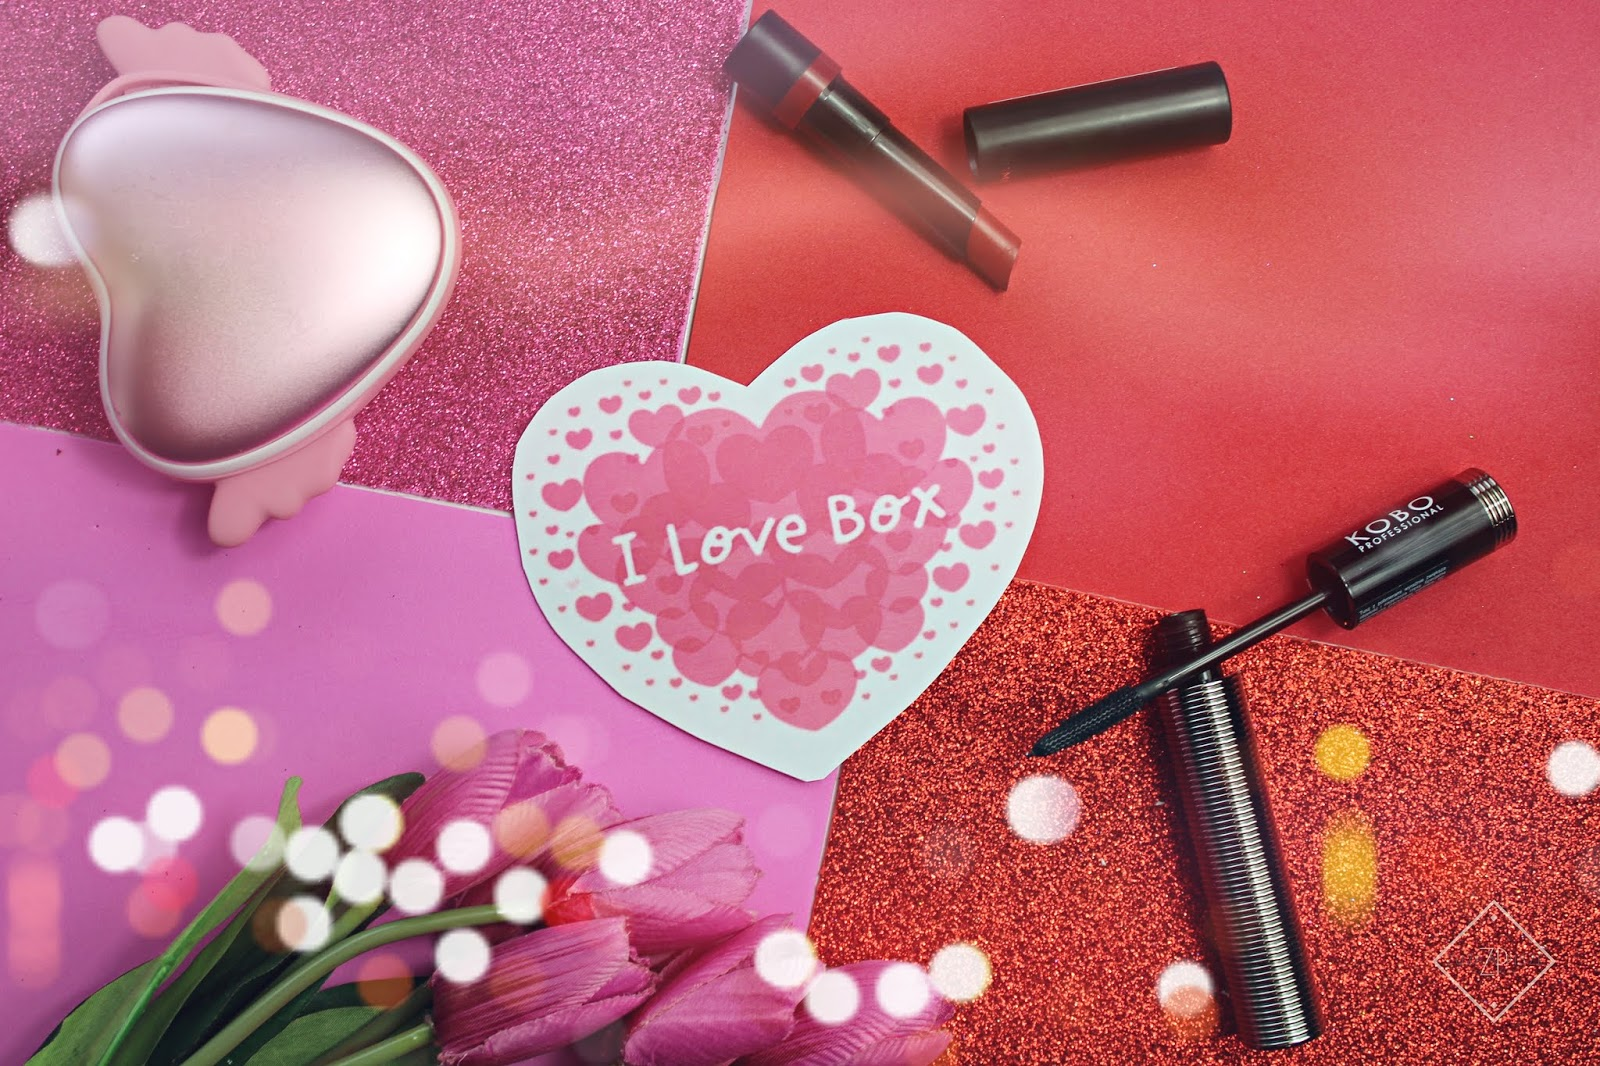 I LOVE BOX - Randka w ciemno - Styczeń 2020